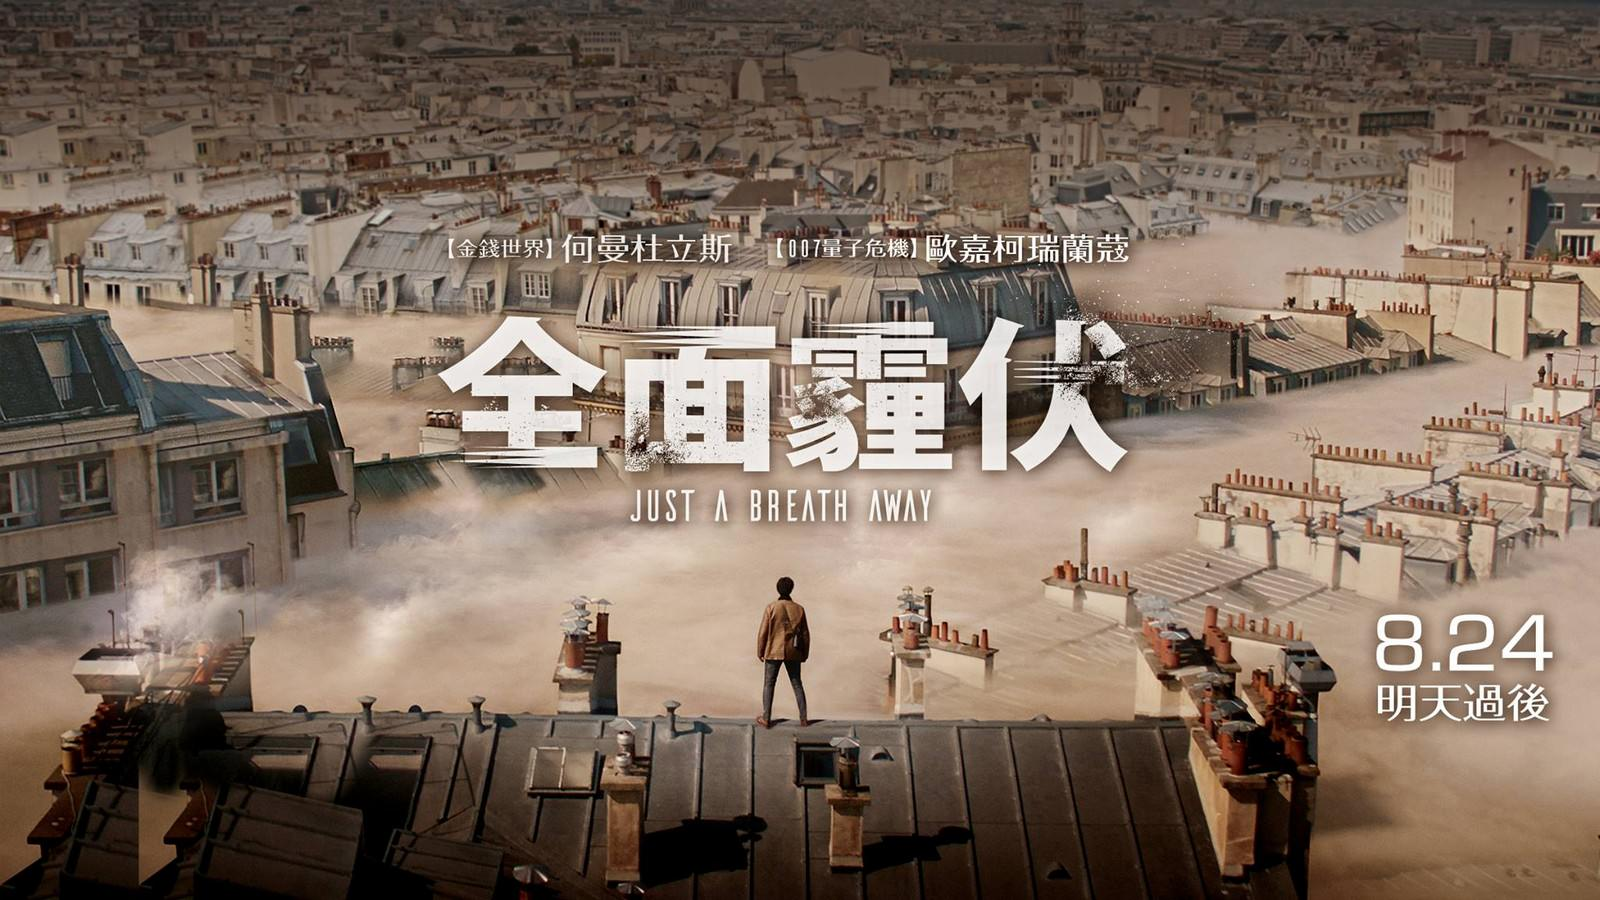 Movie, Dans la brume(法國.加拿大) / 全面霾伏(台) / Just a Breath Away(英文) / 呼吸(網), 電影海報, 台灣, 橫版